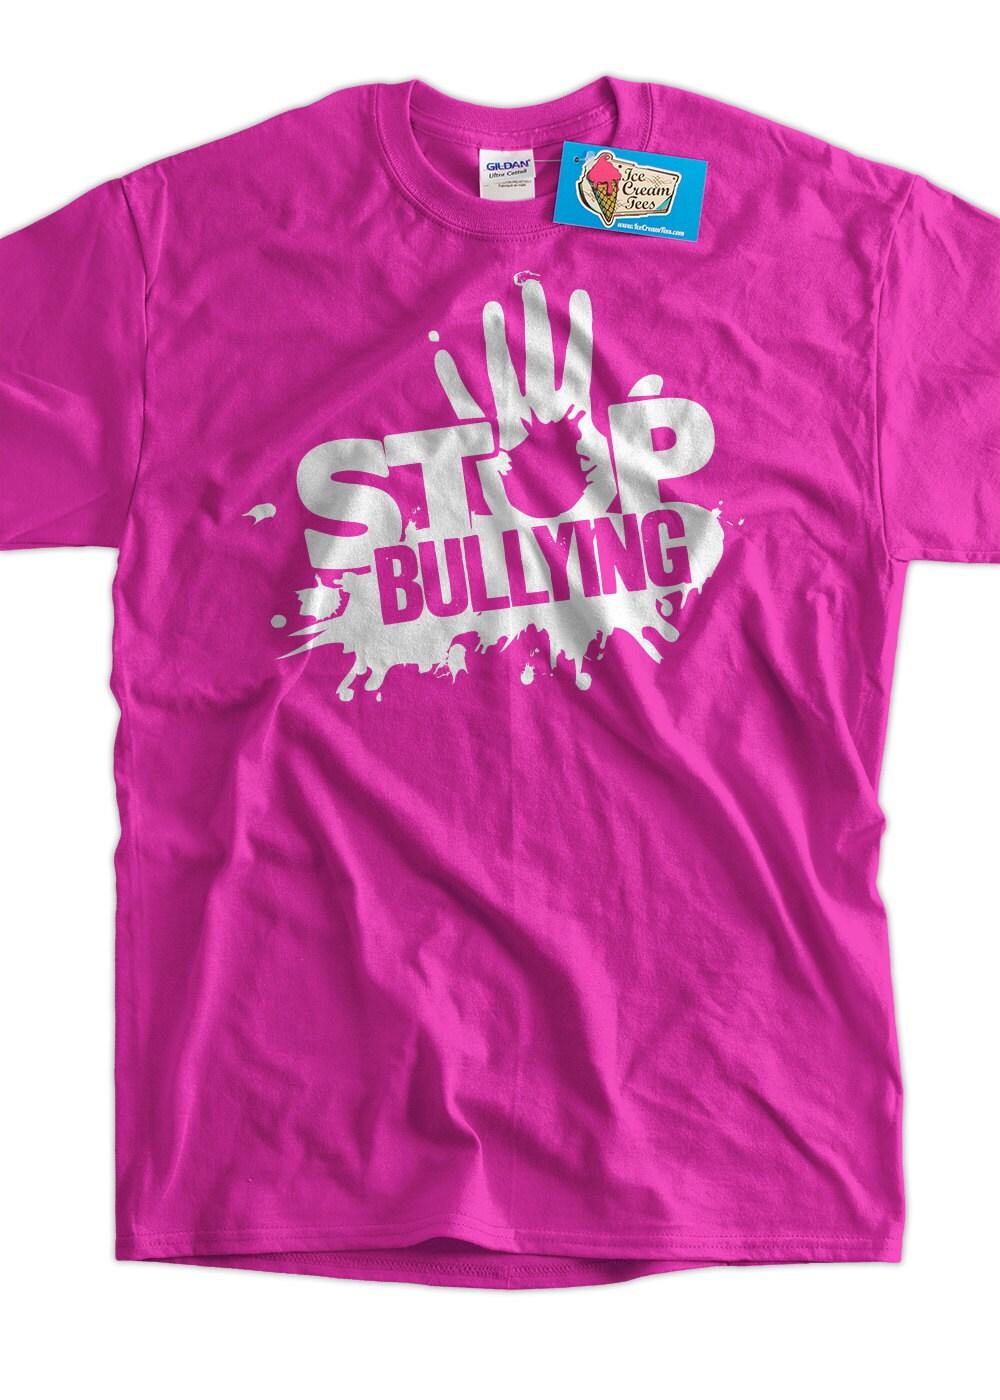 Anti Bullying Stop Bullying T Shirt School Pink Shirt Day